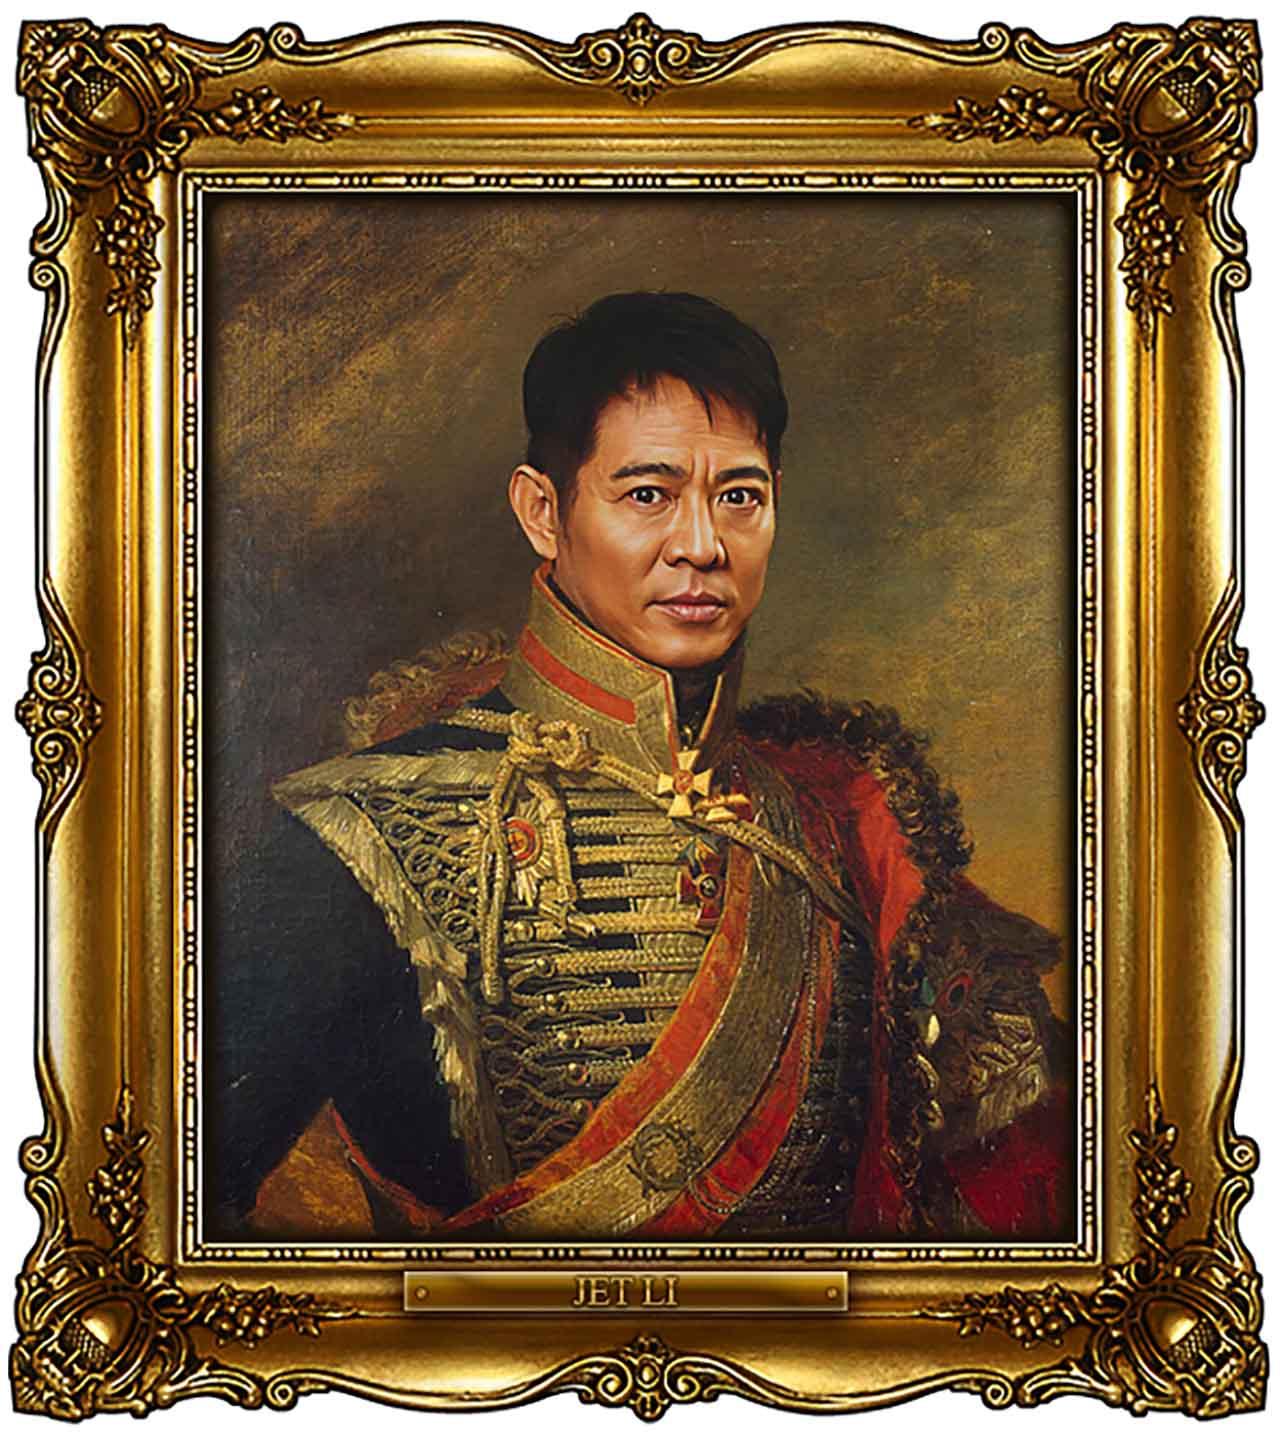 Artist Turns Famous Actors Into Russian Generals - Jet Li